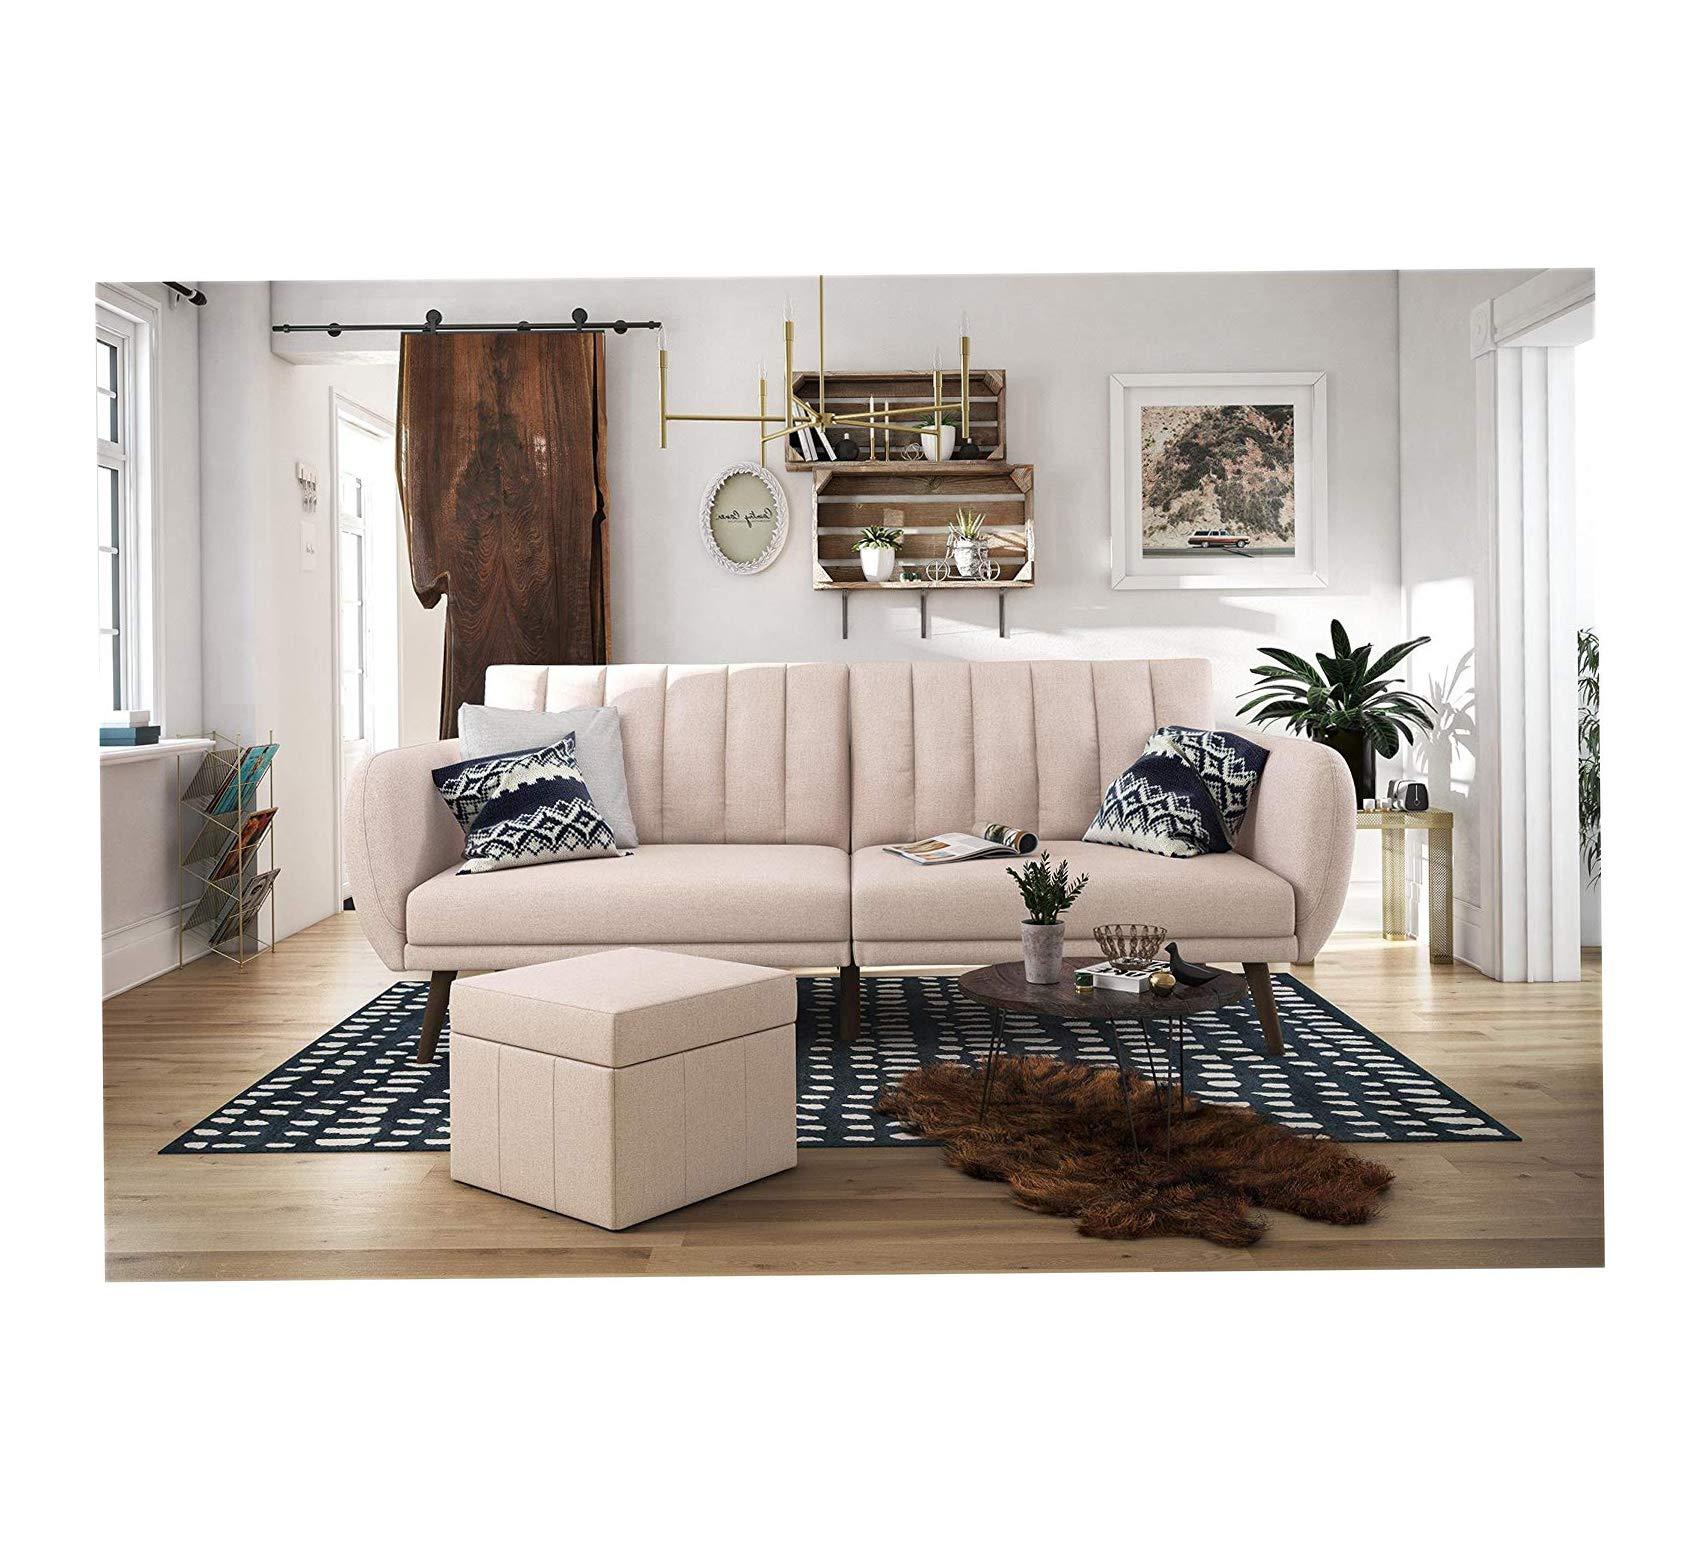 Home Sofa Futon, Premium Linen Upholstery and Wooden Legs, Pink Linen Office Décor Studio Living Heavy Duty Commercial Bar Café Restaurant by Wood & Style